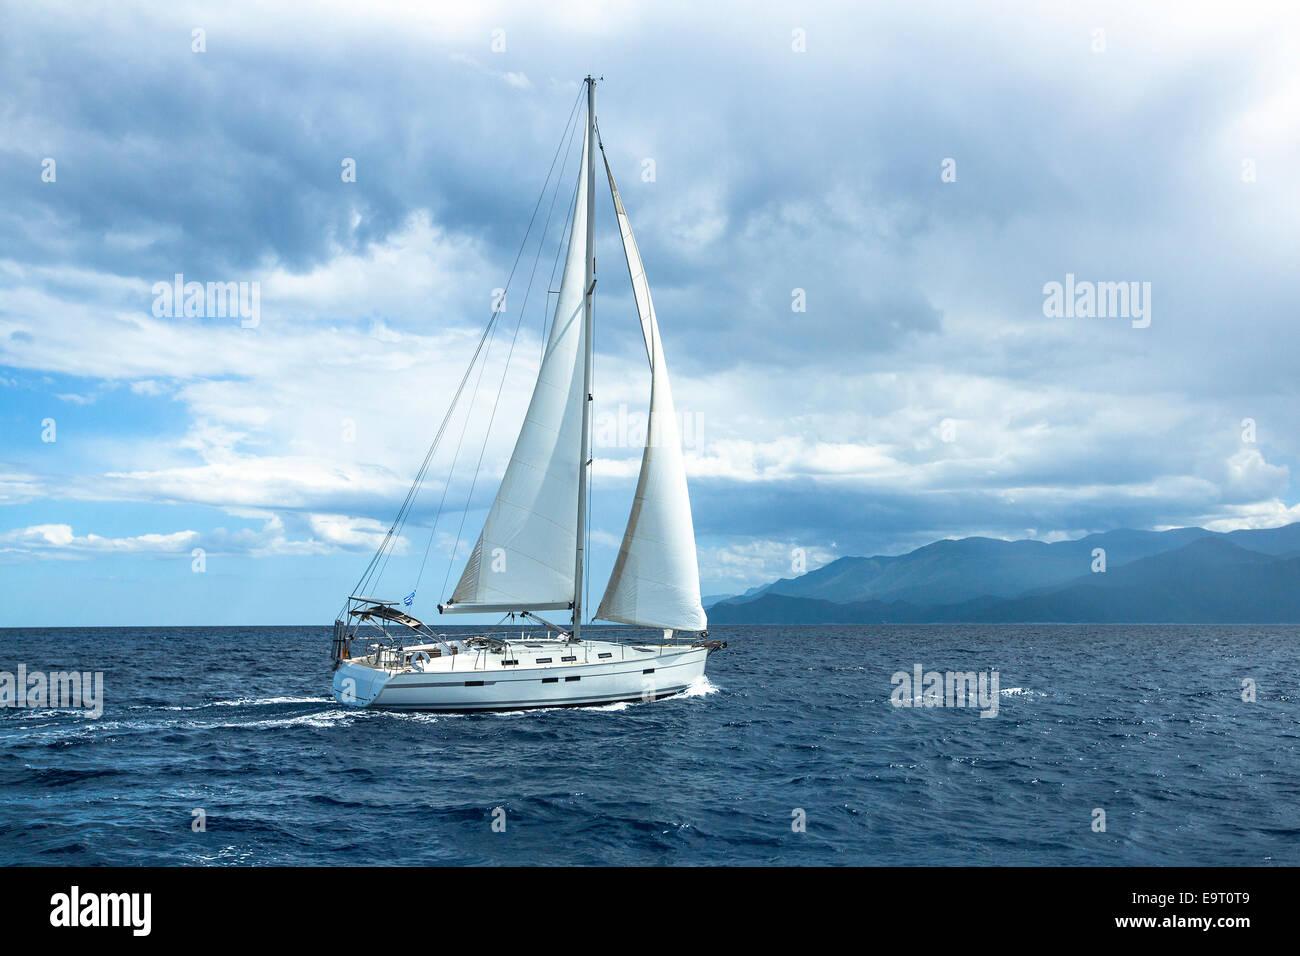 Segeln bei bewölktem Wetter. Yachting. Luxus-Yachten. Stockbild